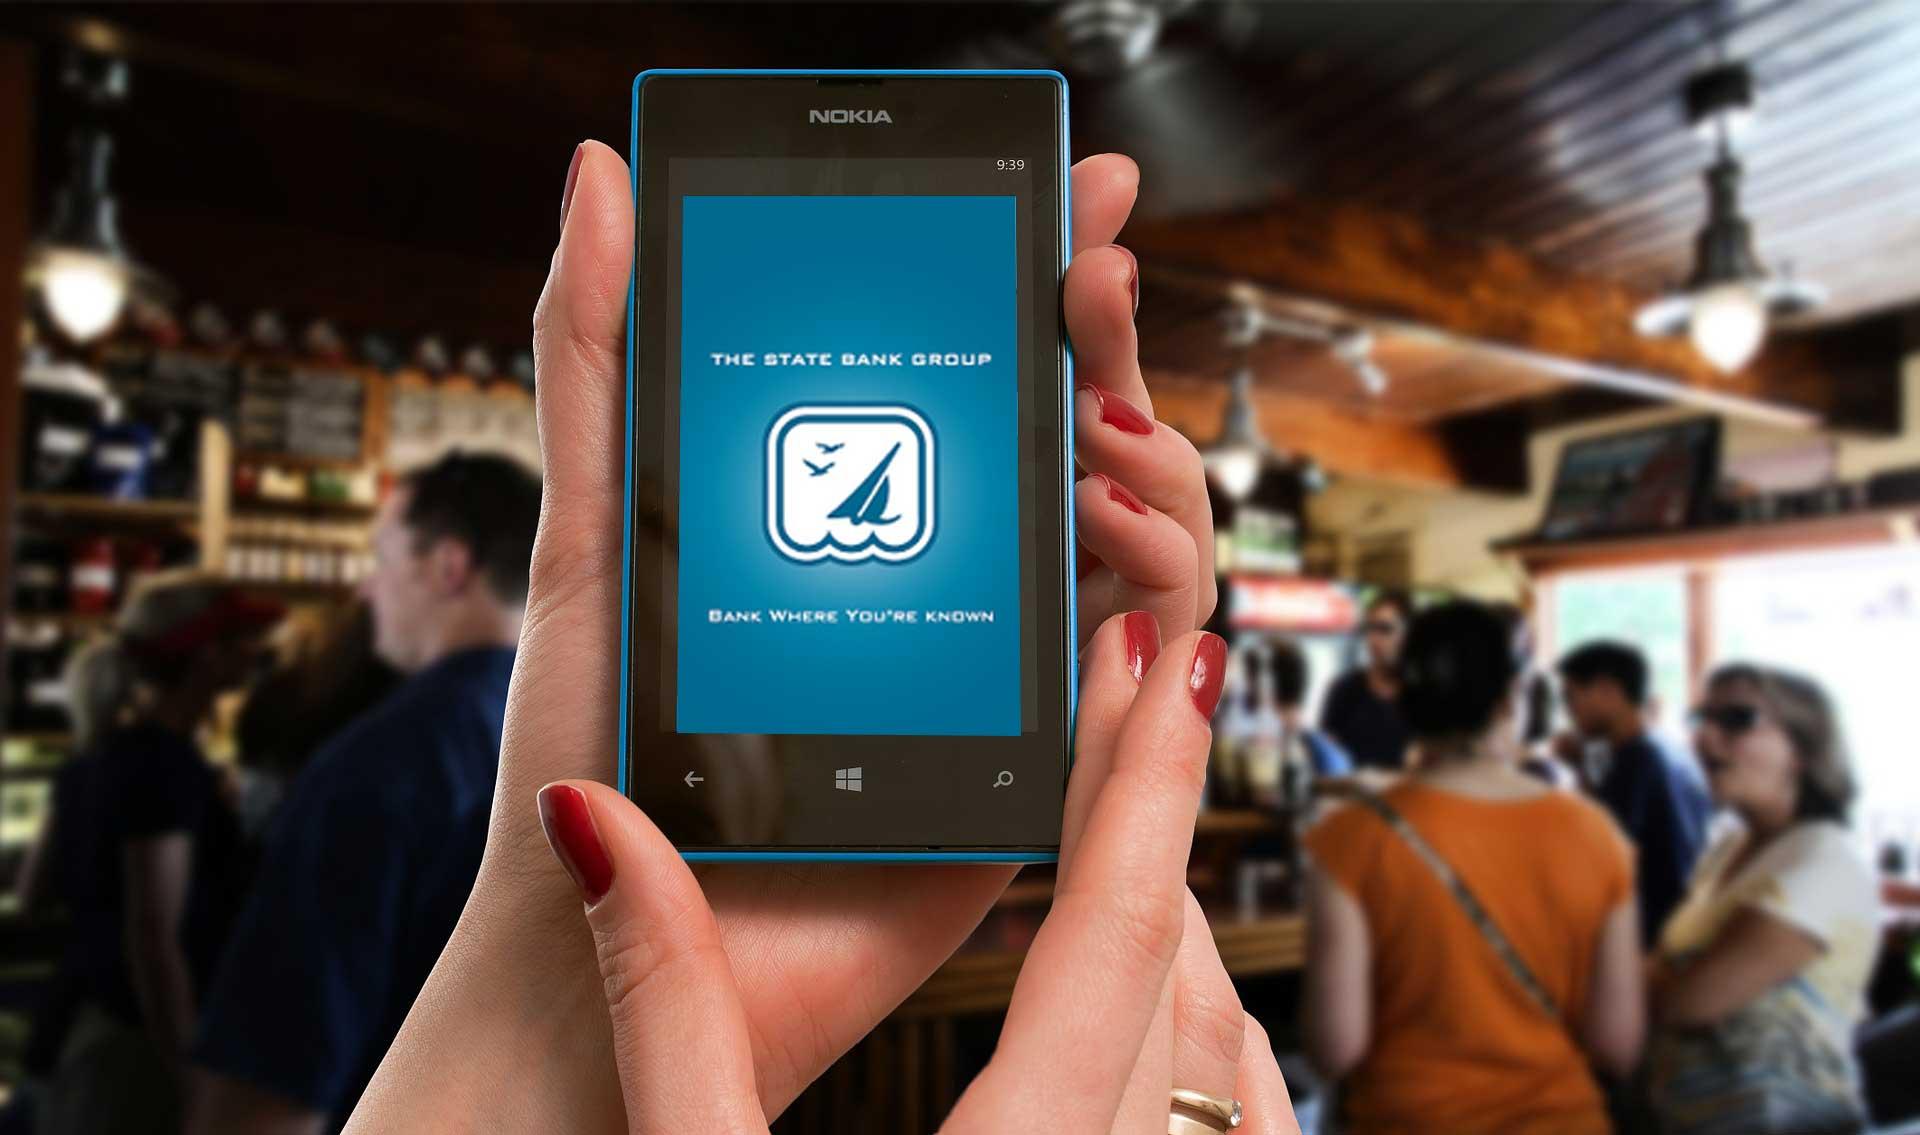 Get the TSBG Mobile Banking App